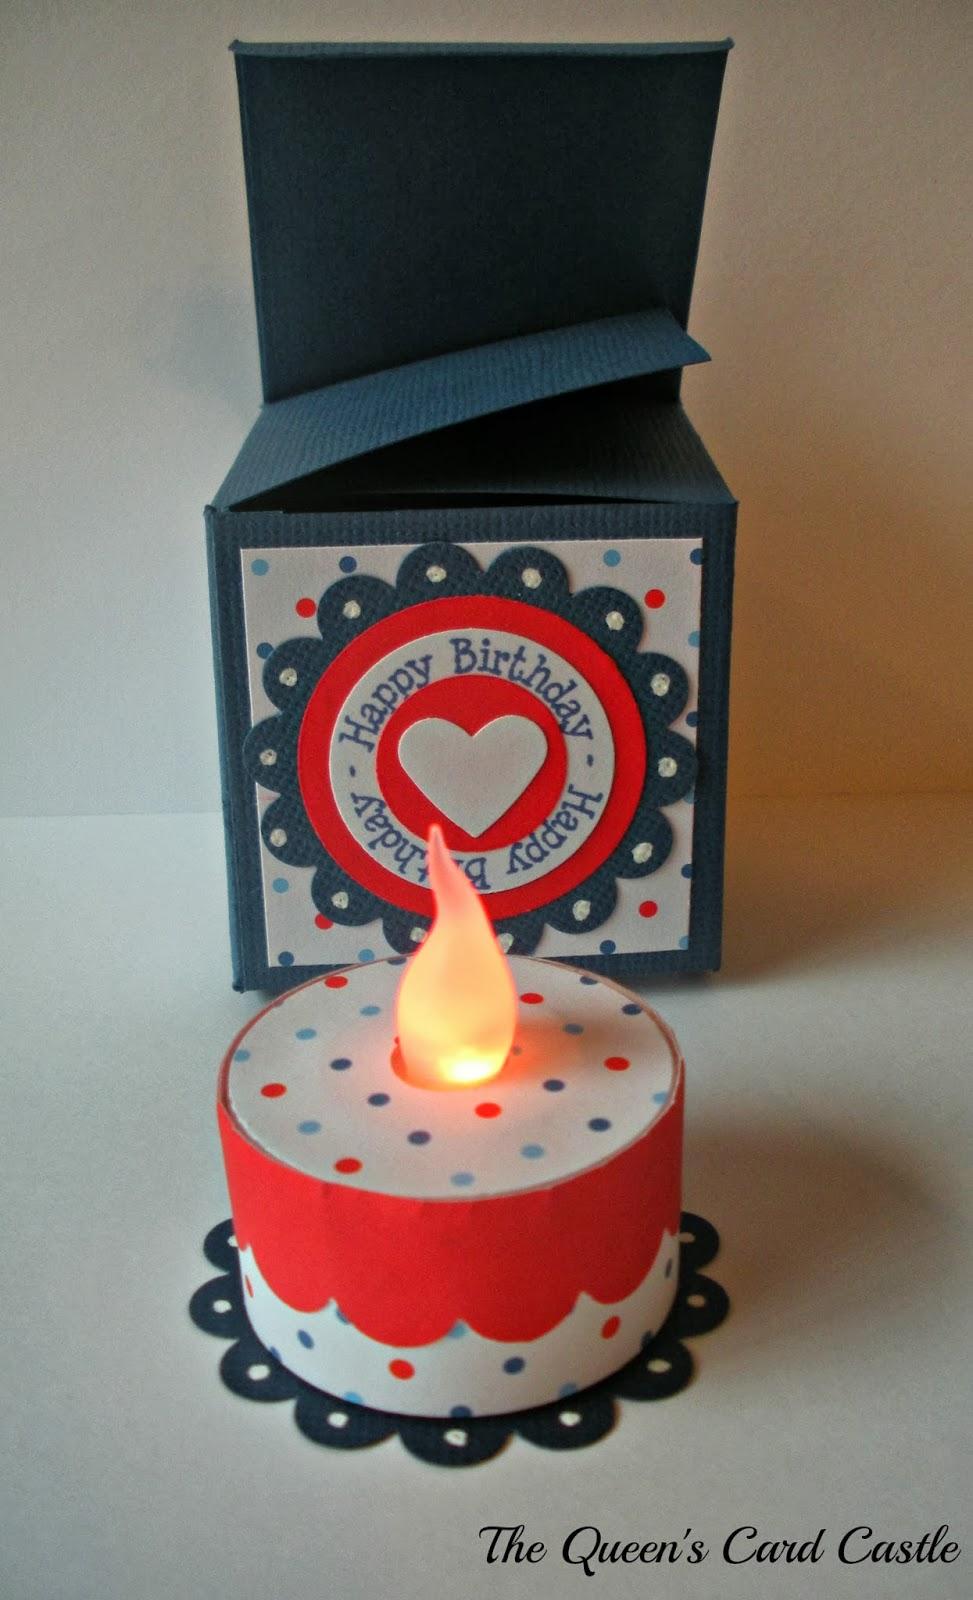 The Queen's Card Castle: Mini Birthday Cake